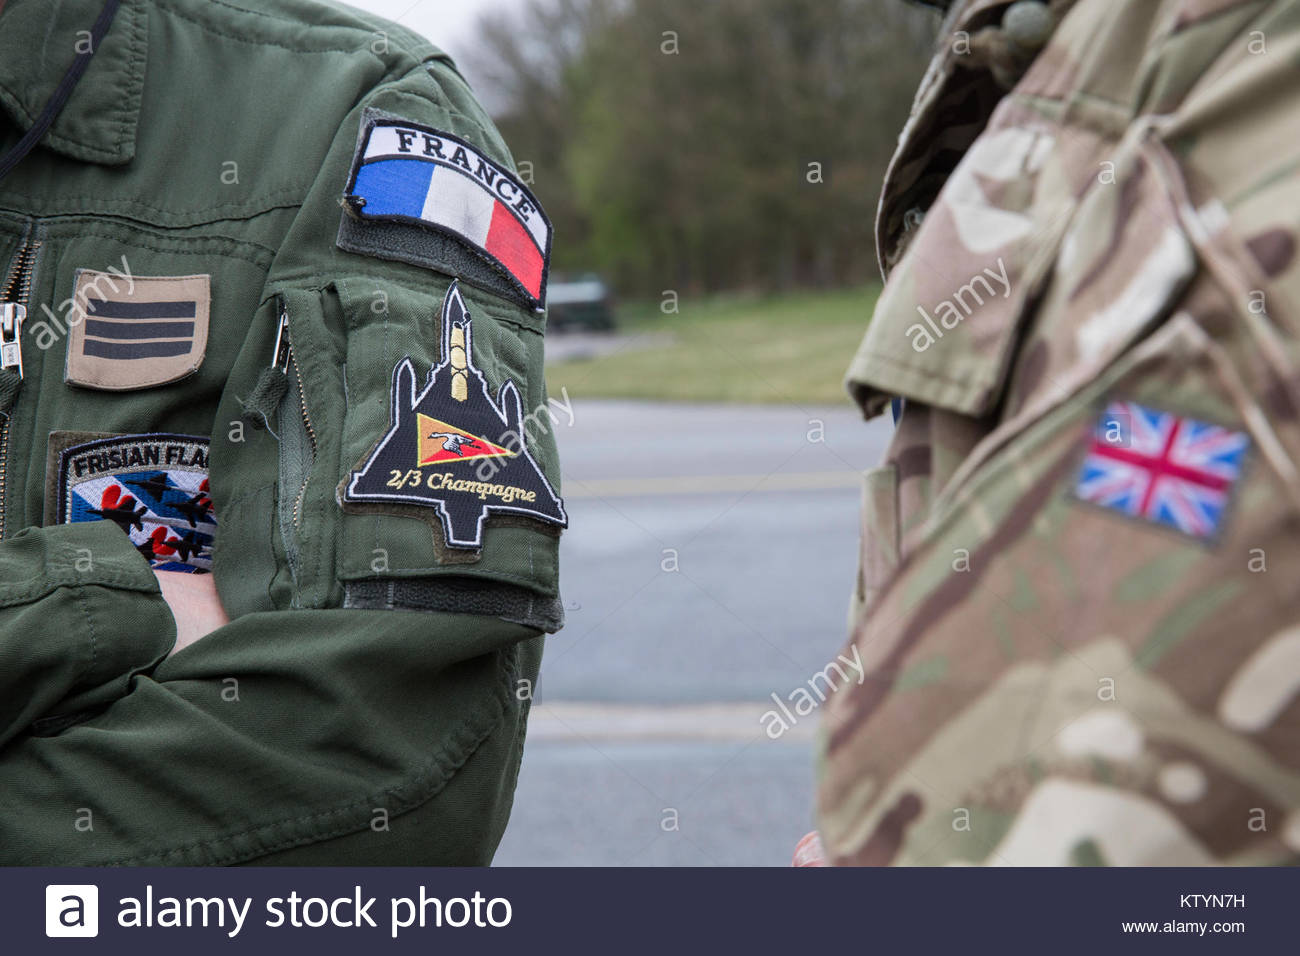 United Kingdom Royal Air Force Insignia Stock Photos ...